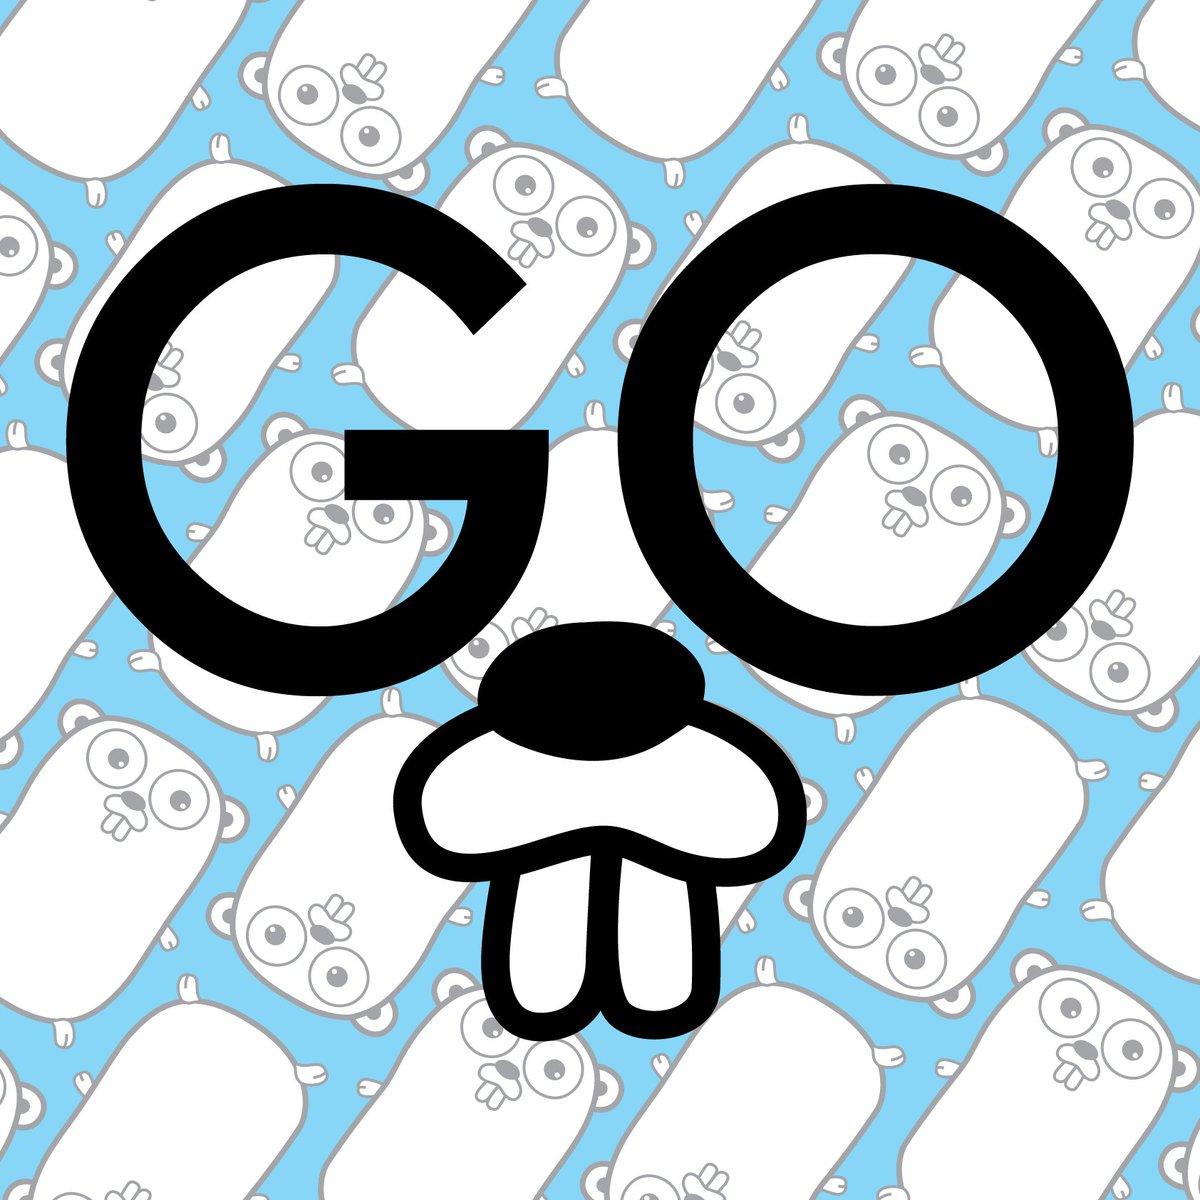 Go 1.6 has been released. https://t.co/TW4k94f8hs  Get it while it's hot! https://t.co/StazJXrC1k  #golang https://t.co/0joL38RQai